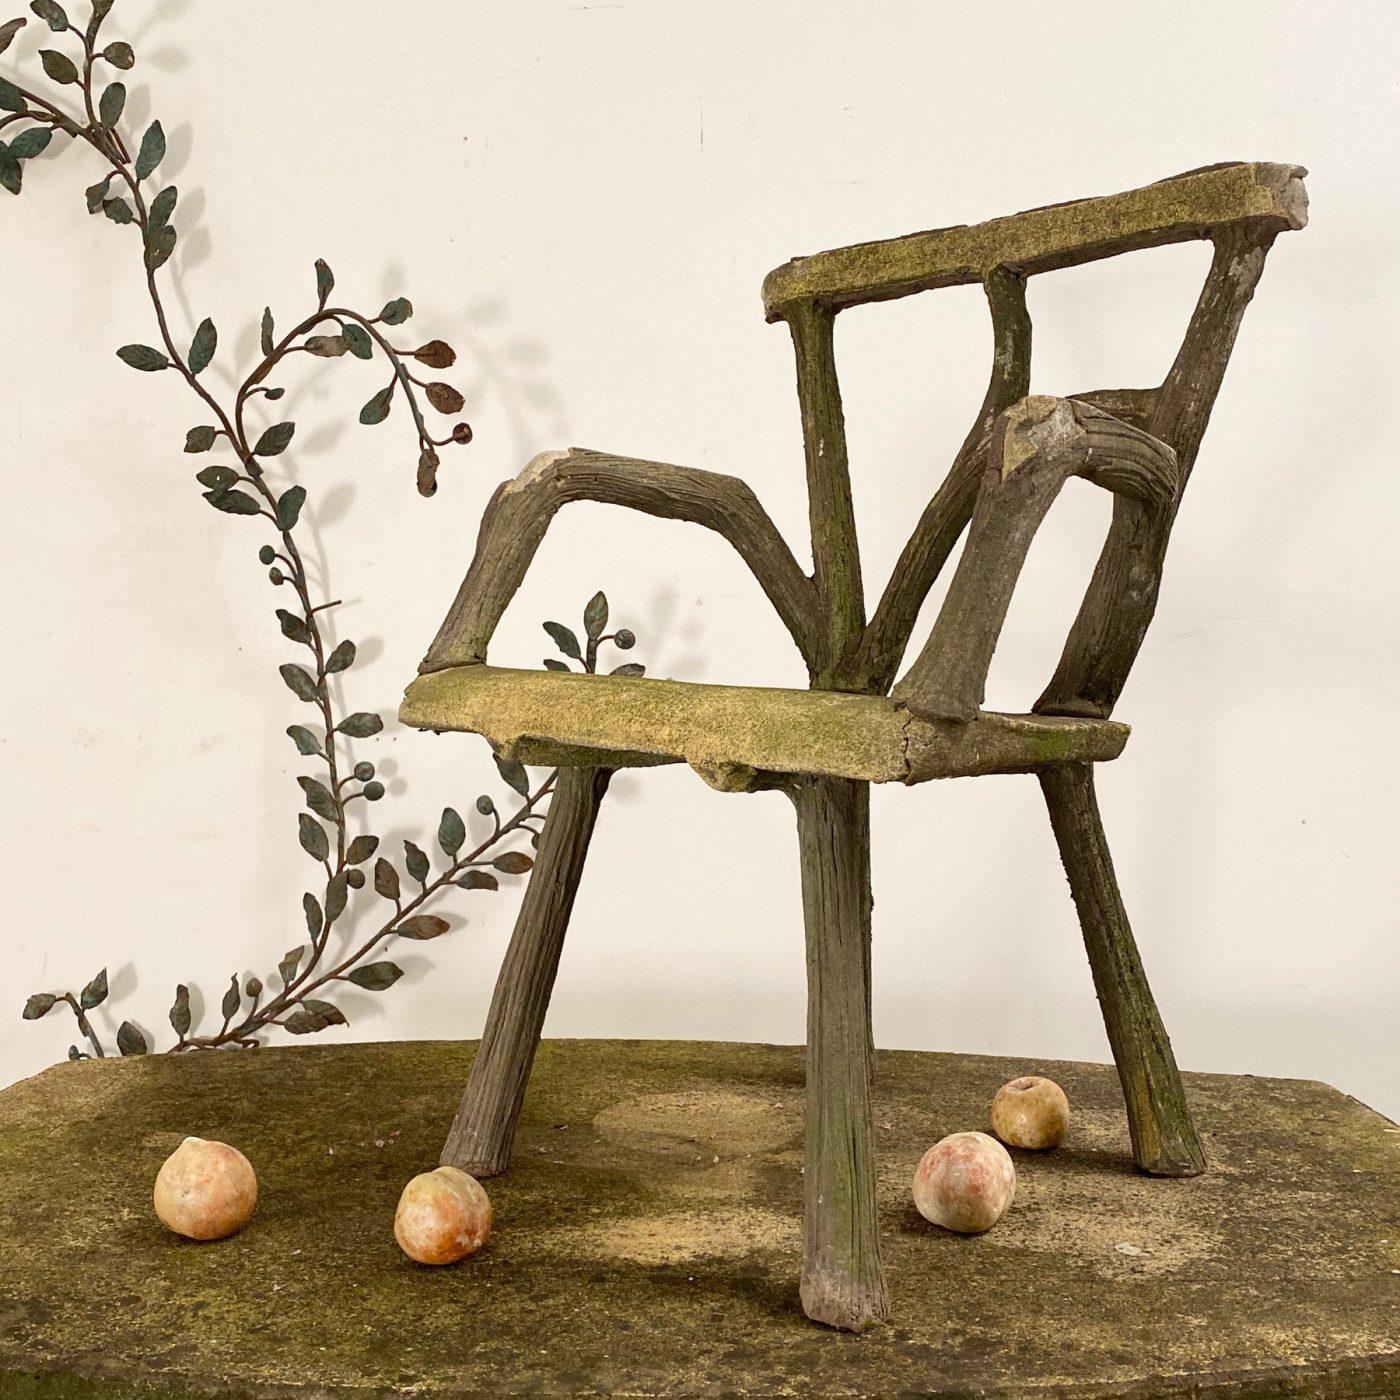 objet-vagabond-garden-set0004